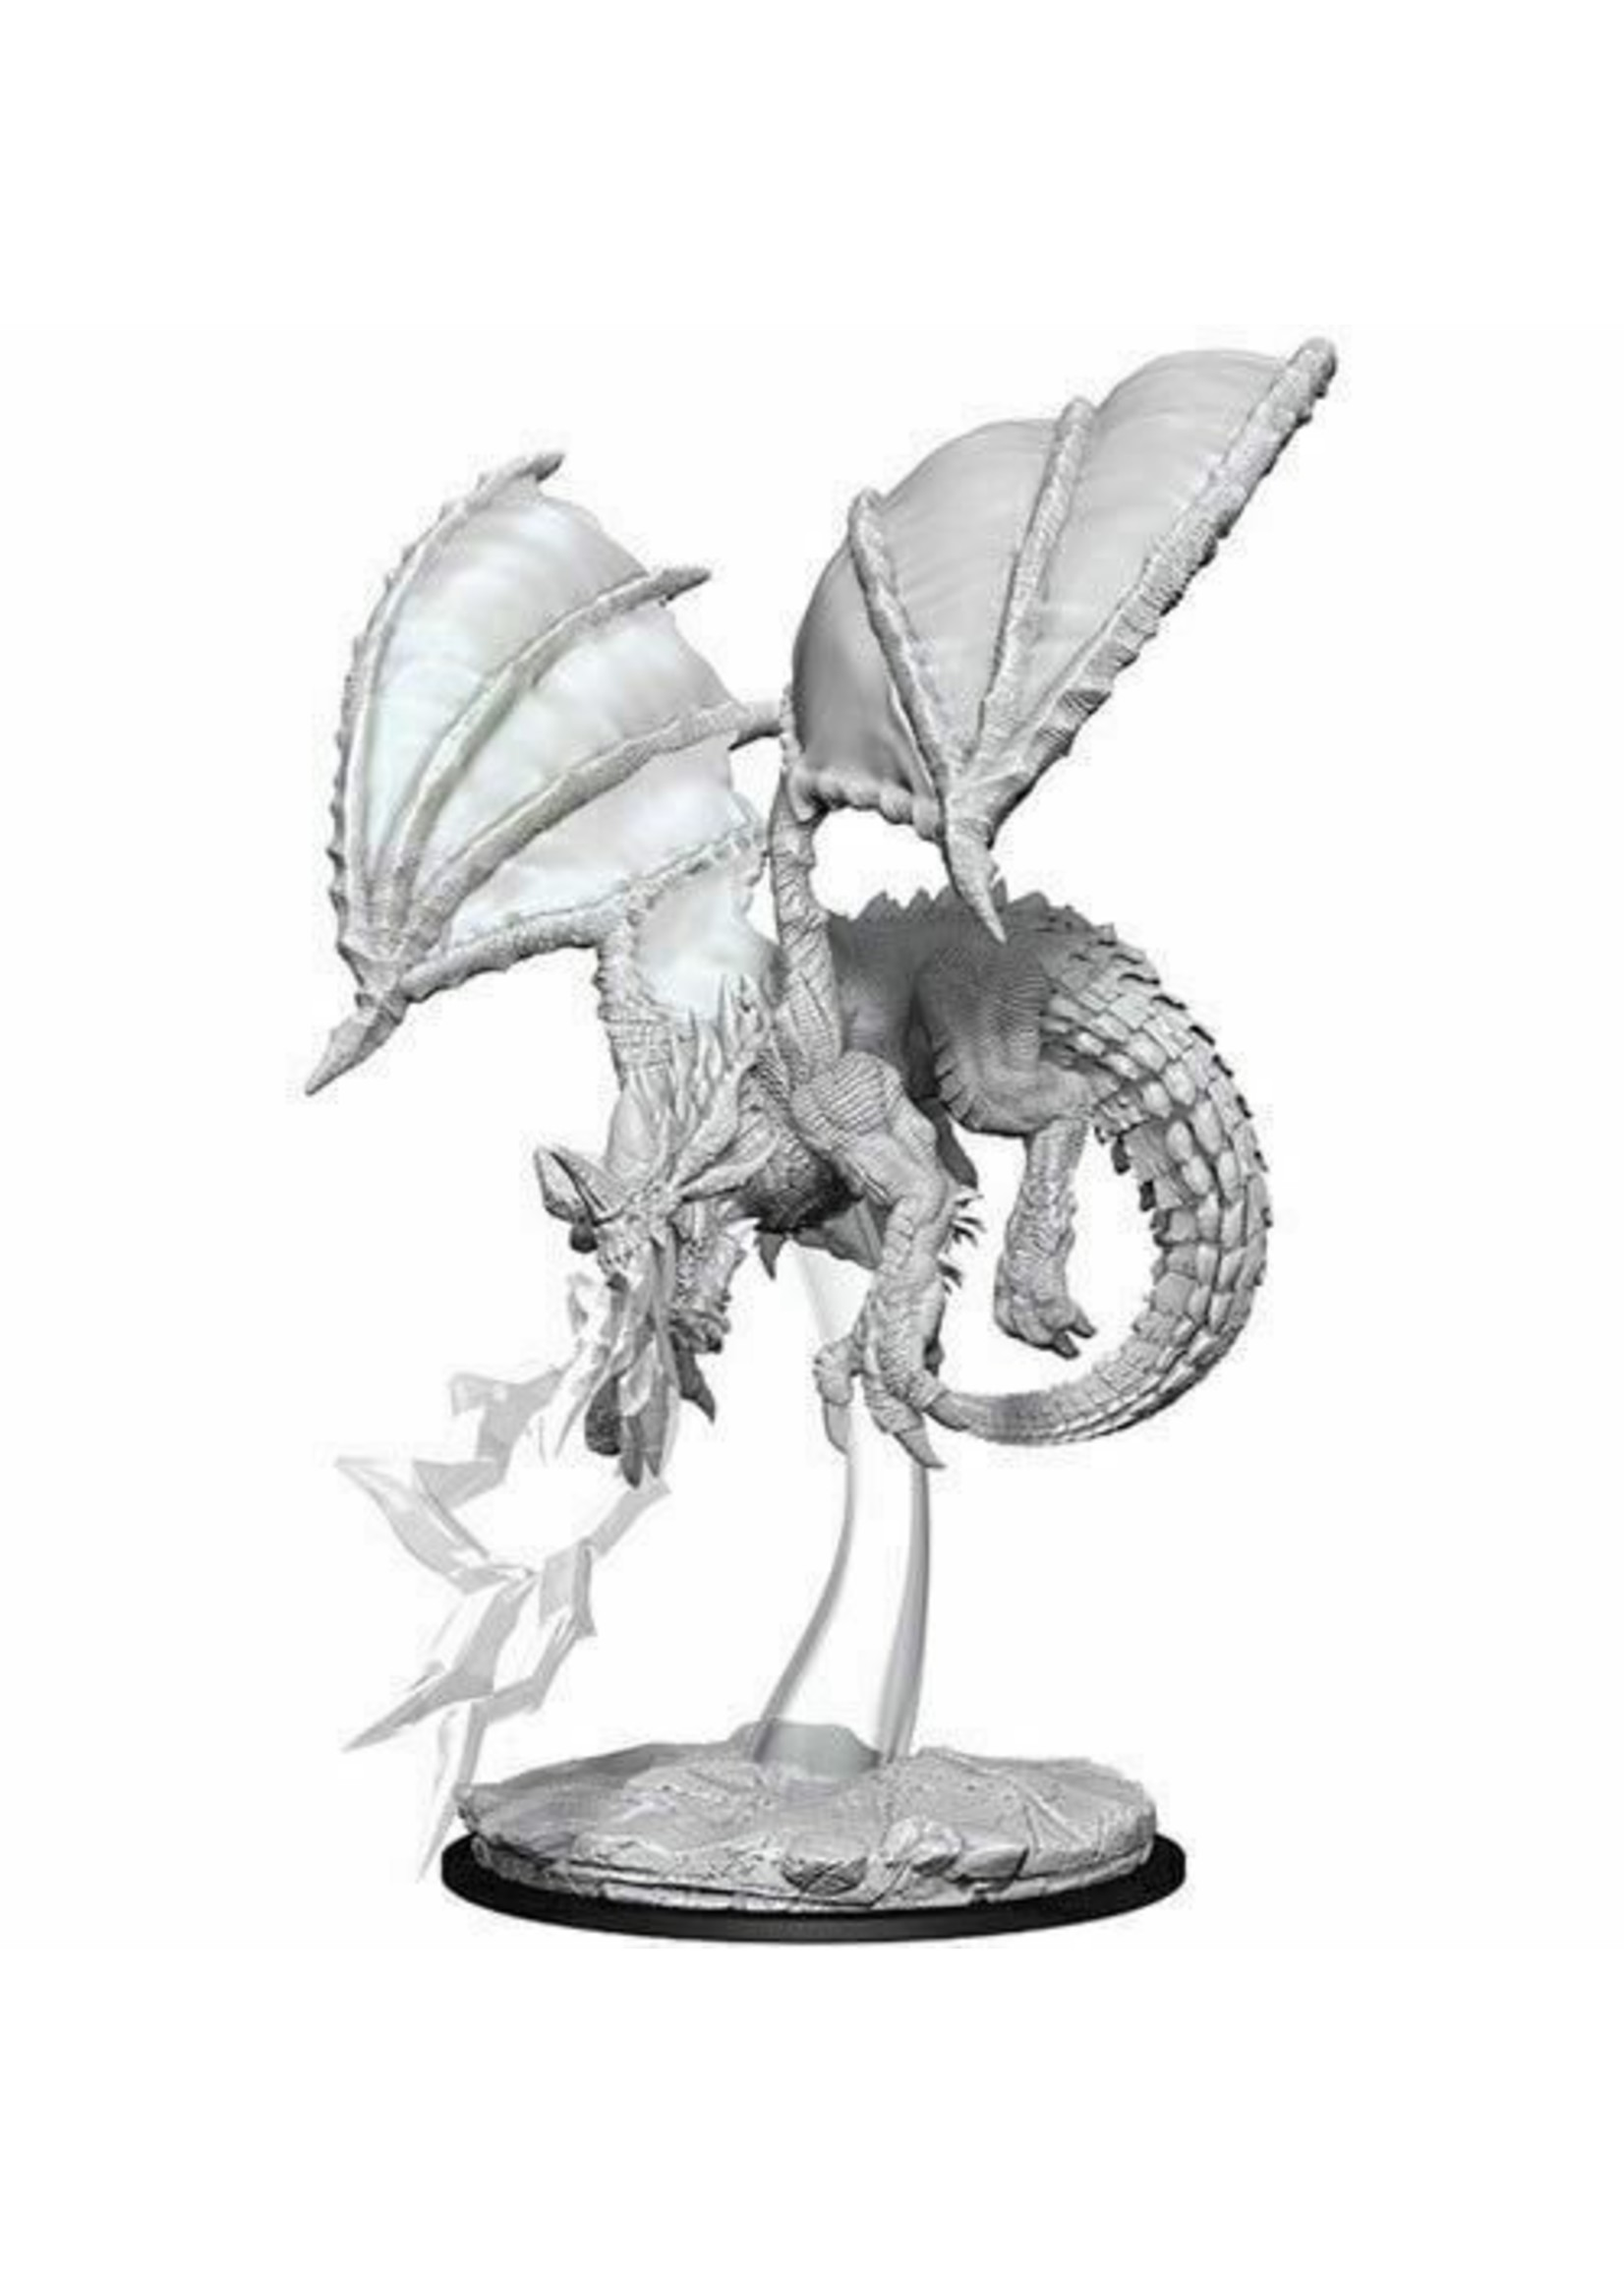 Dungeons & Dragons Nolzur`s Marvelous Unpainted Miniatures: W8 Young Blue Dragon